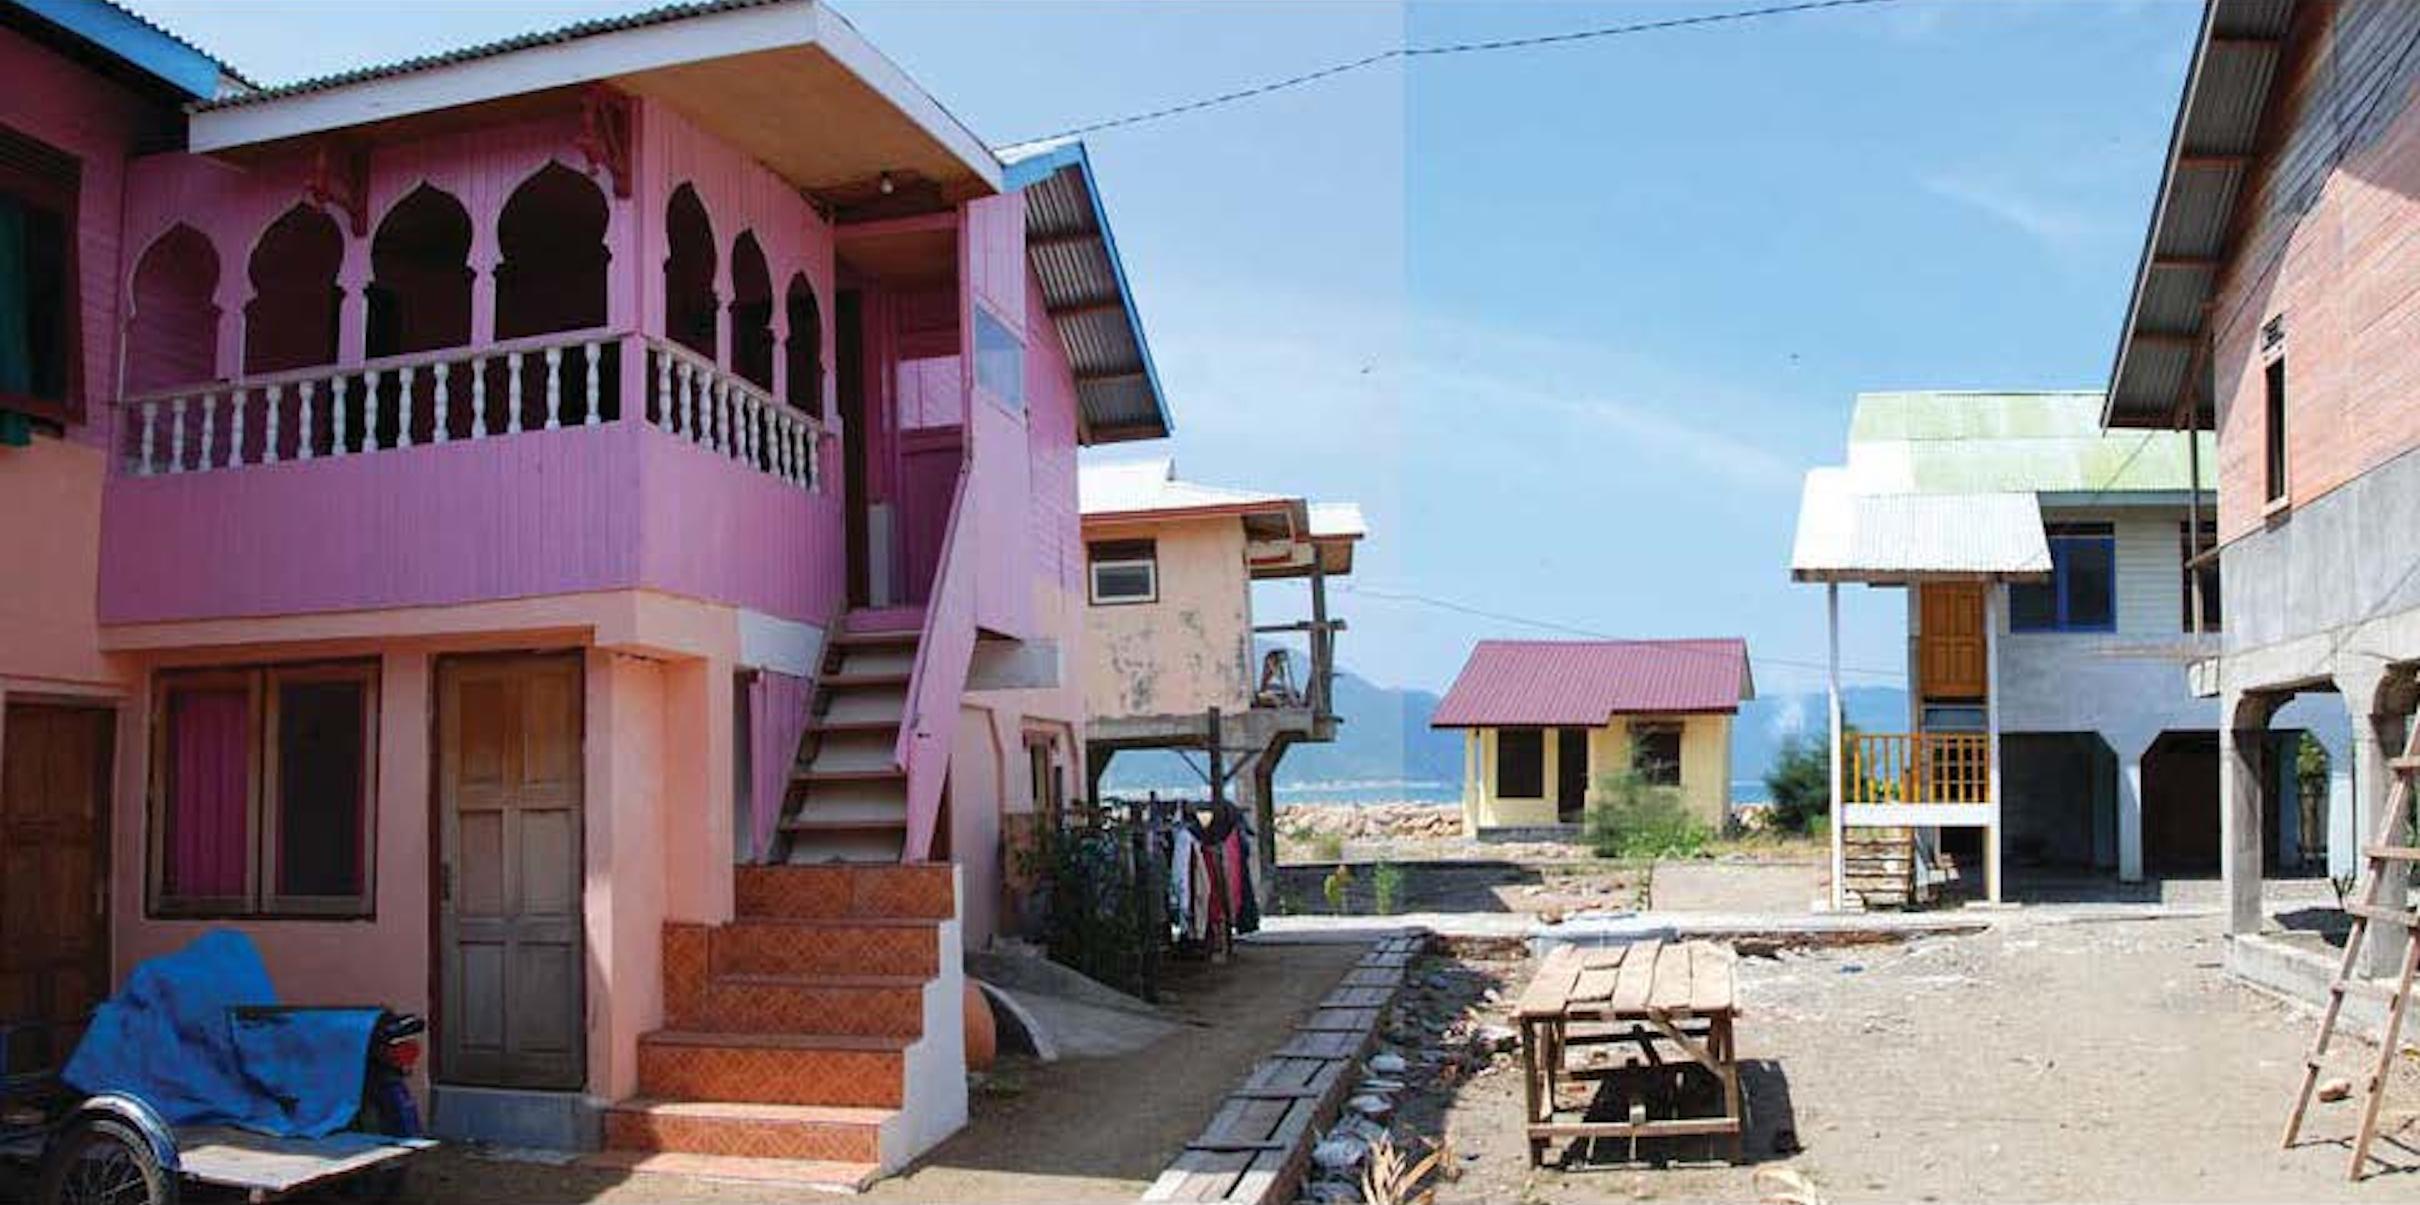 Banda Aceh Post-Tsunami Reconstruction - Banda Aceh, Indonesia